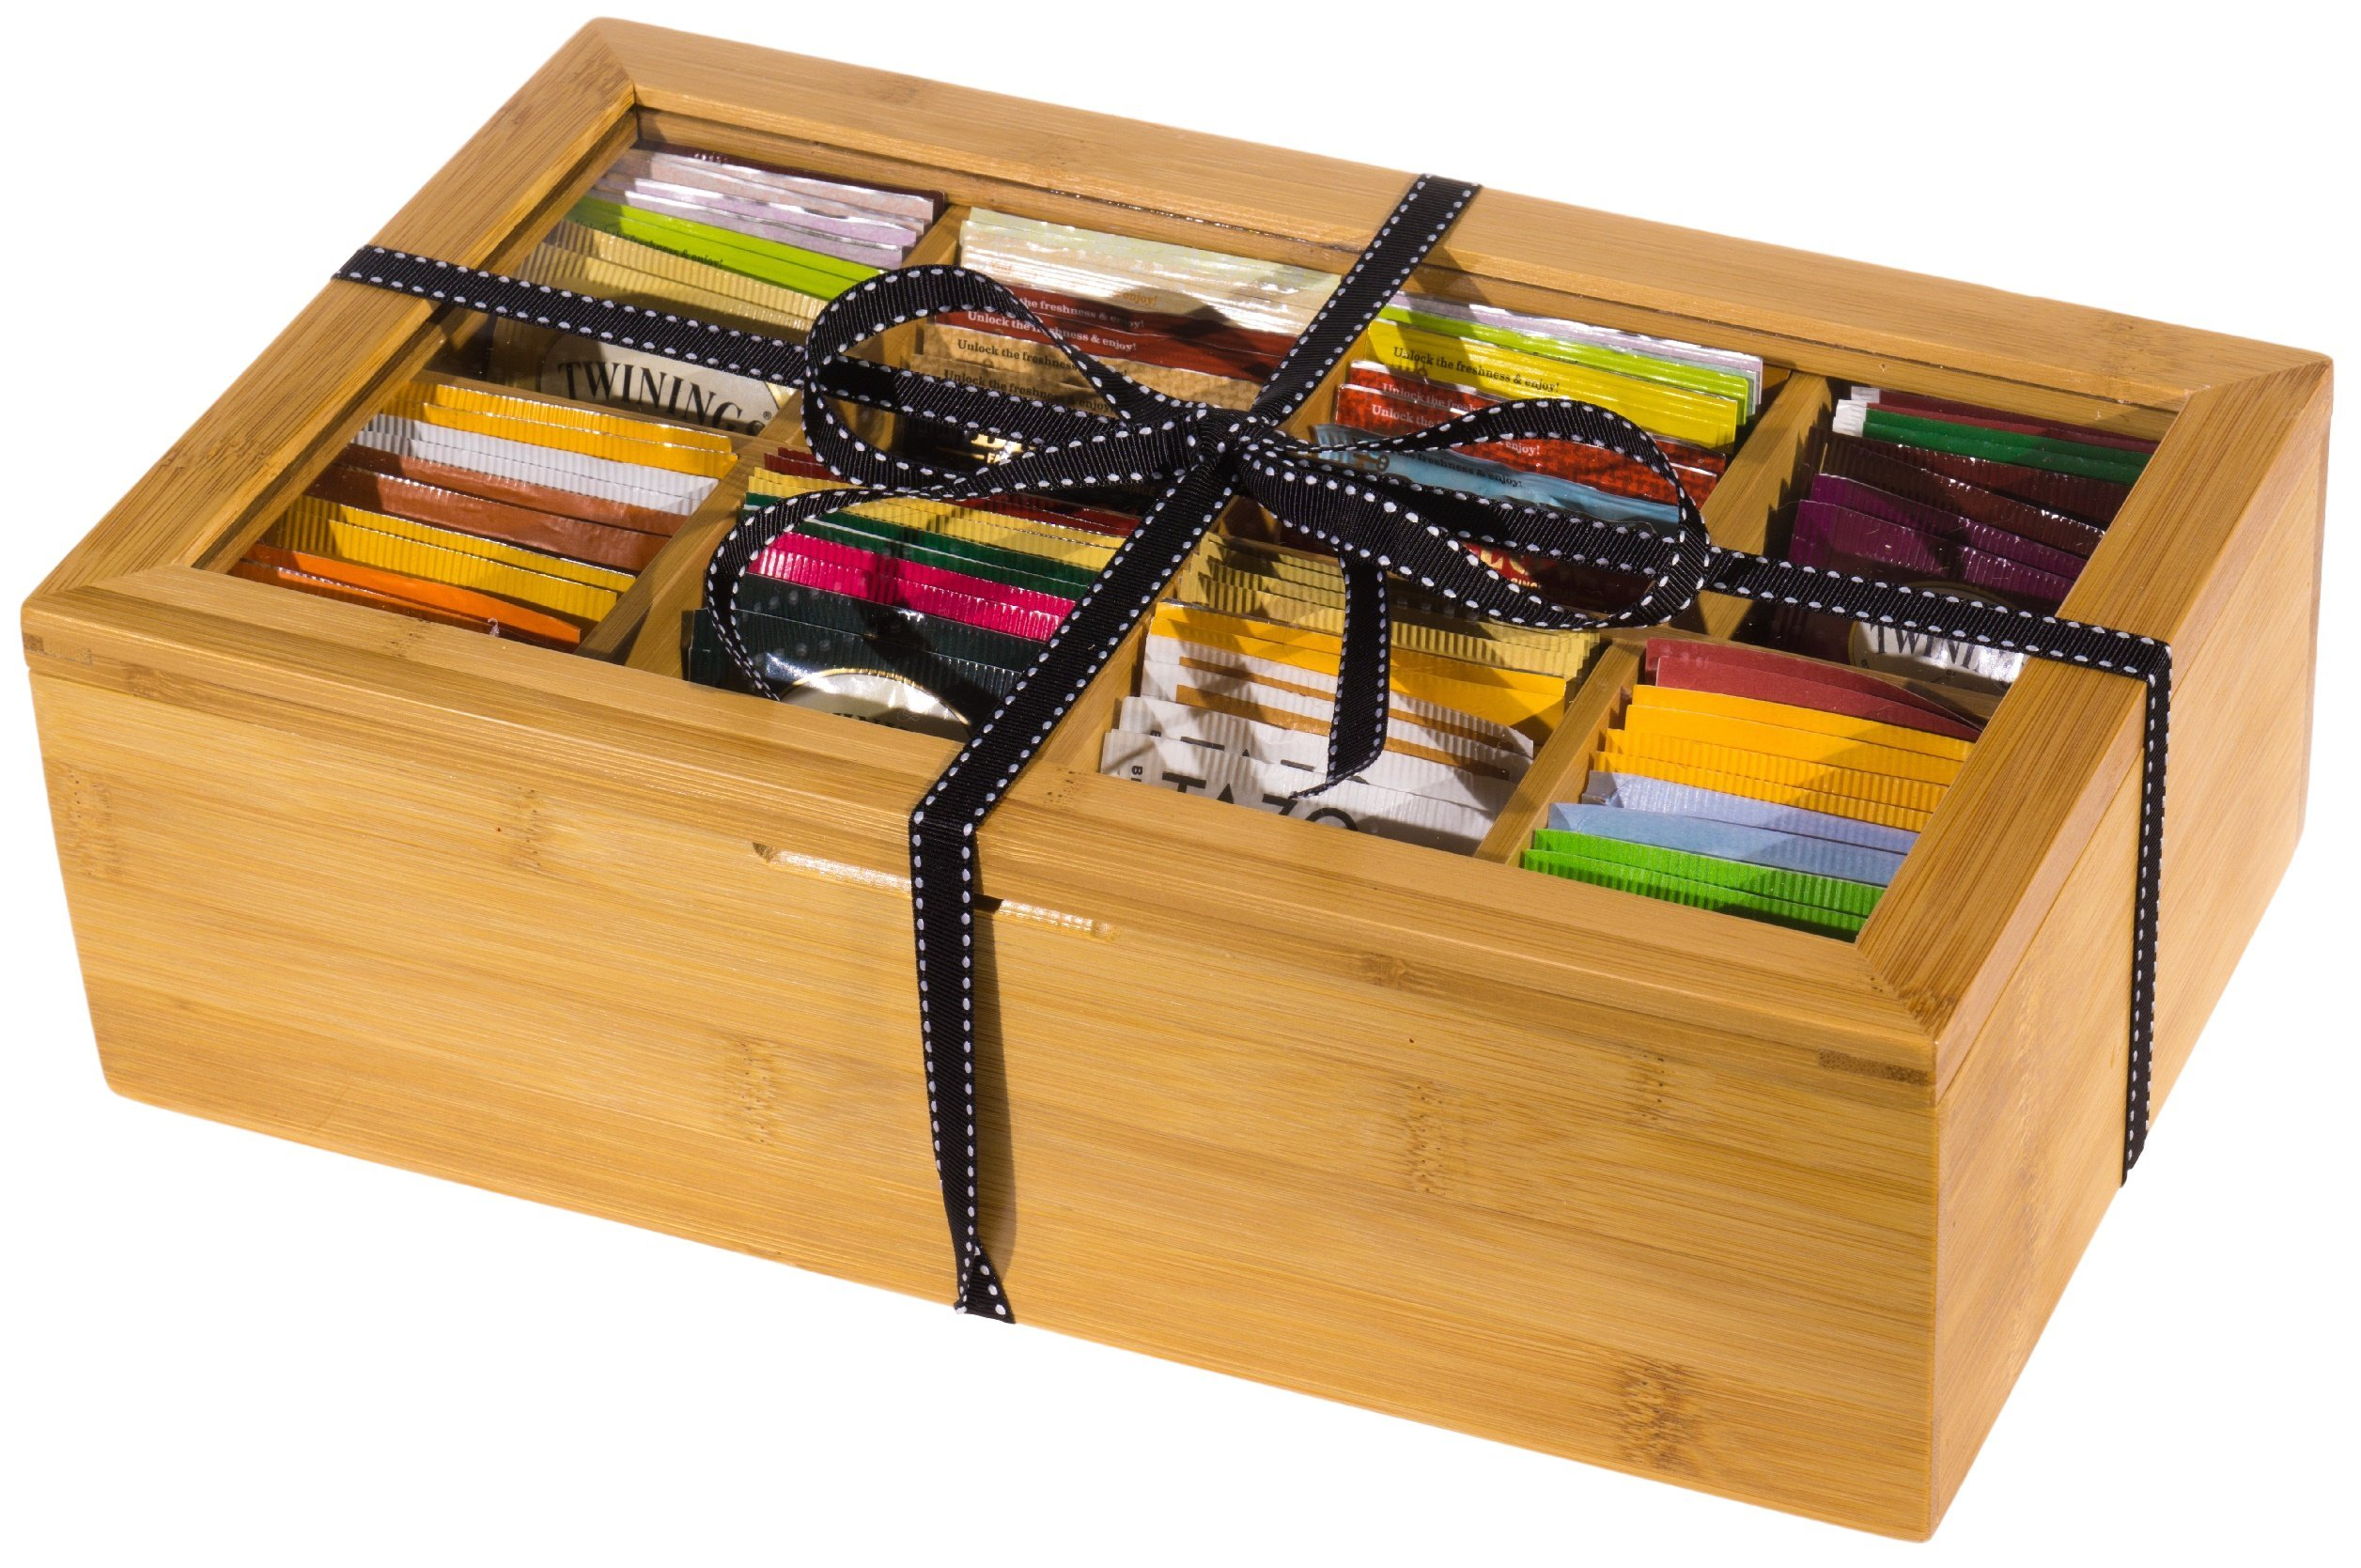 Plenty 4 You Organic Variety Bamboo Tea Chest Set 80 Bag Count with 20 Honey Sticks by Plenty 4 You